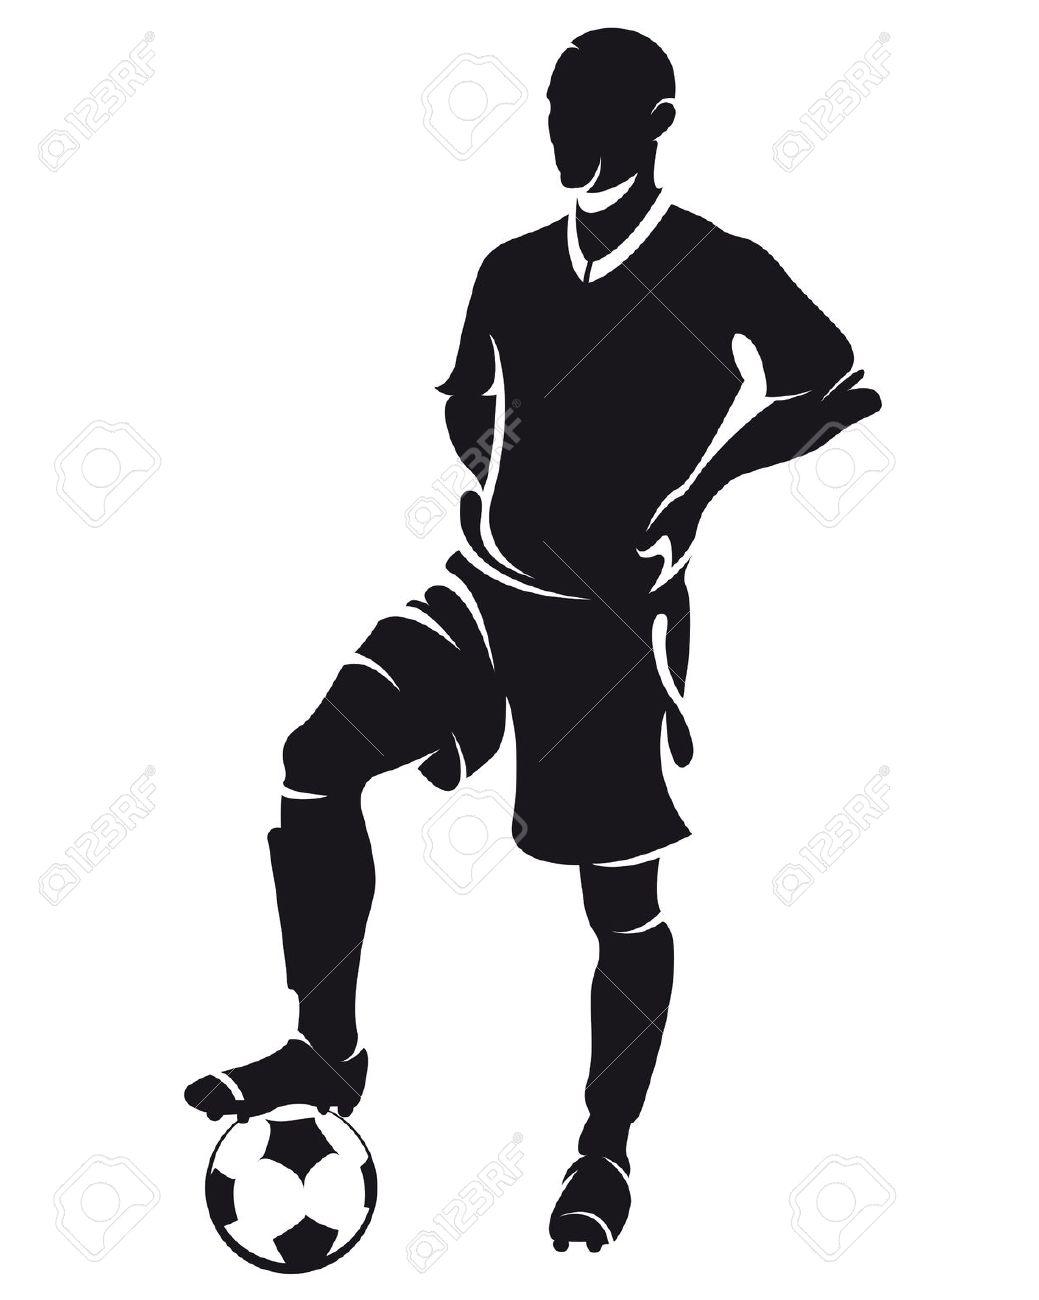 1039x1300 Clip Art Soccer Silhouette Clip Art